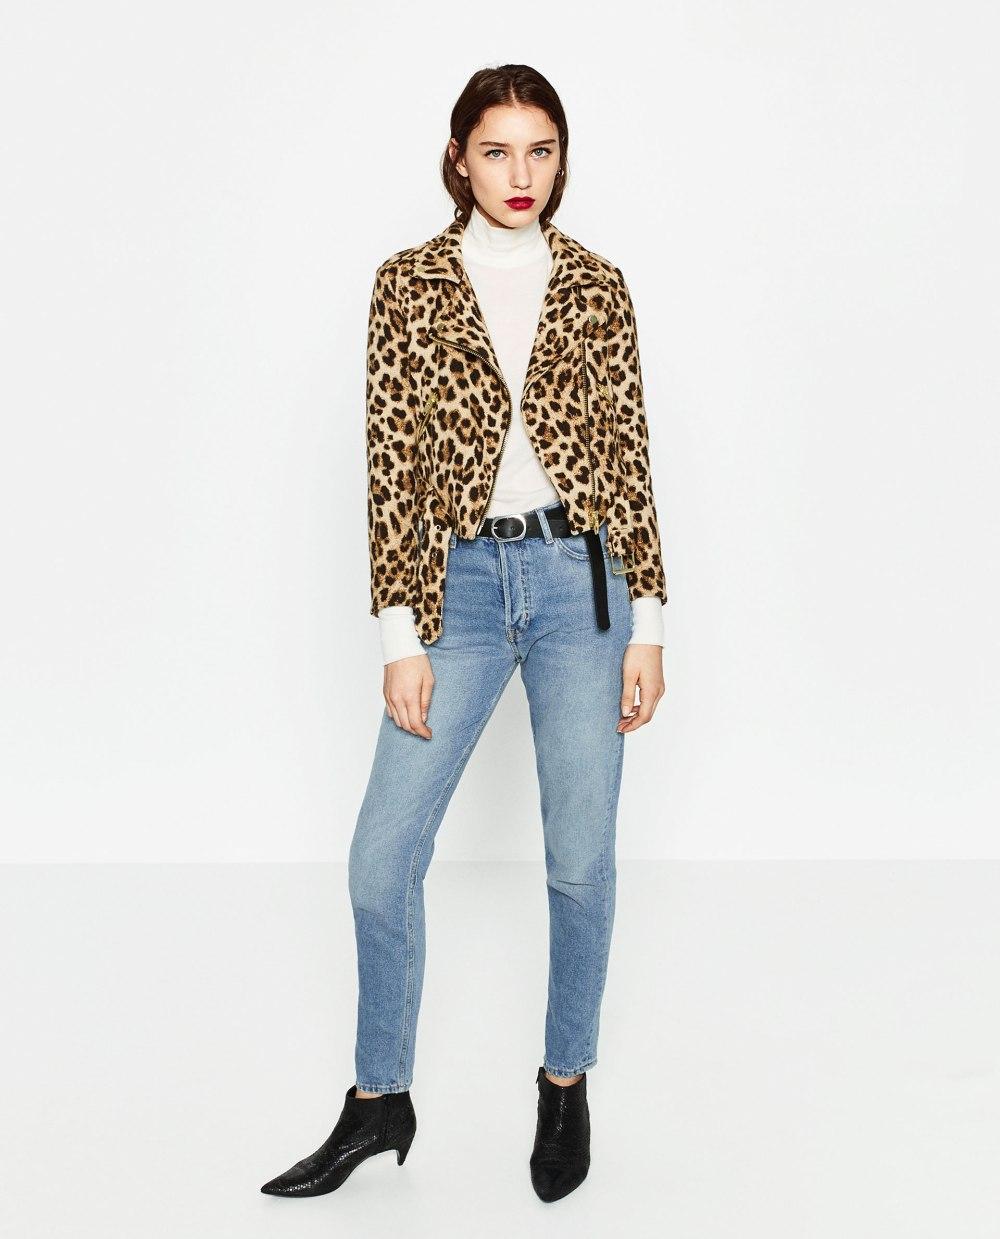 zara-leopard-print-jacket